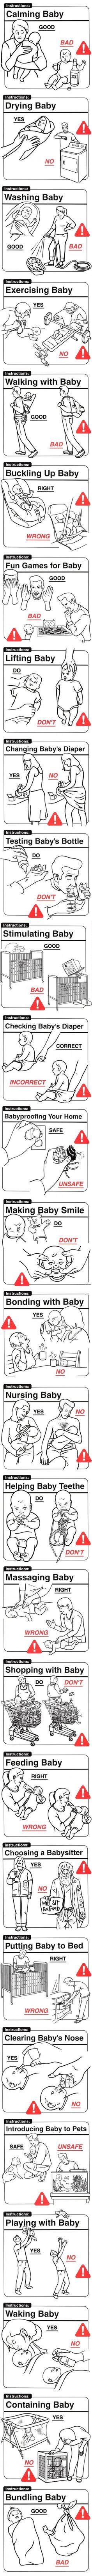 baby treatment